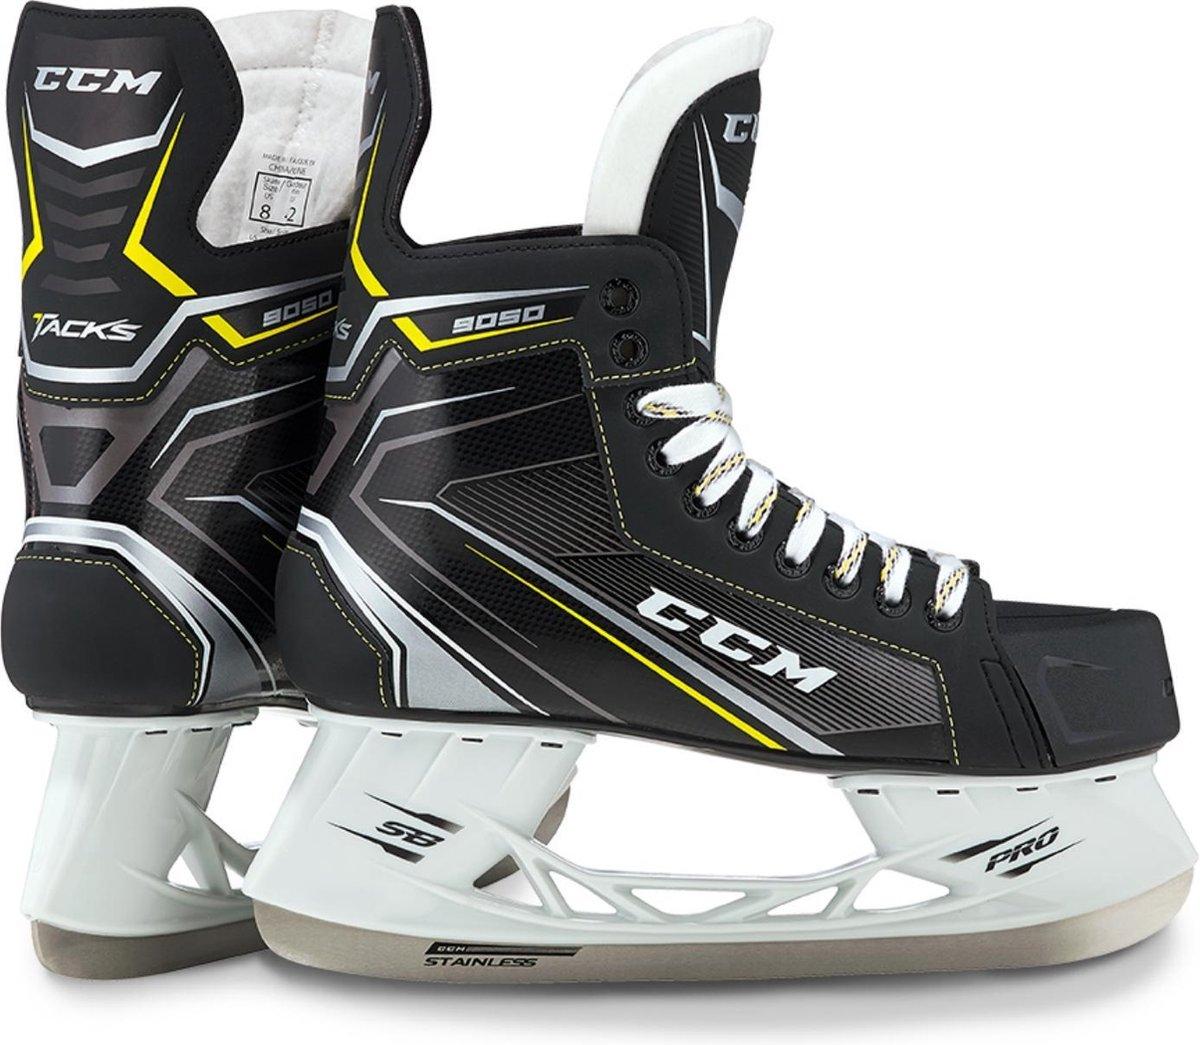 CCM IJshockeyschaatsen TACKS 9050 SR Zwart 44